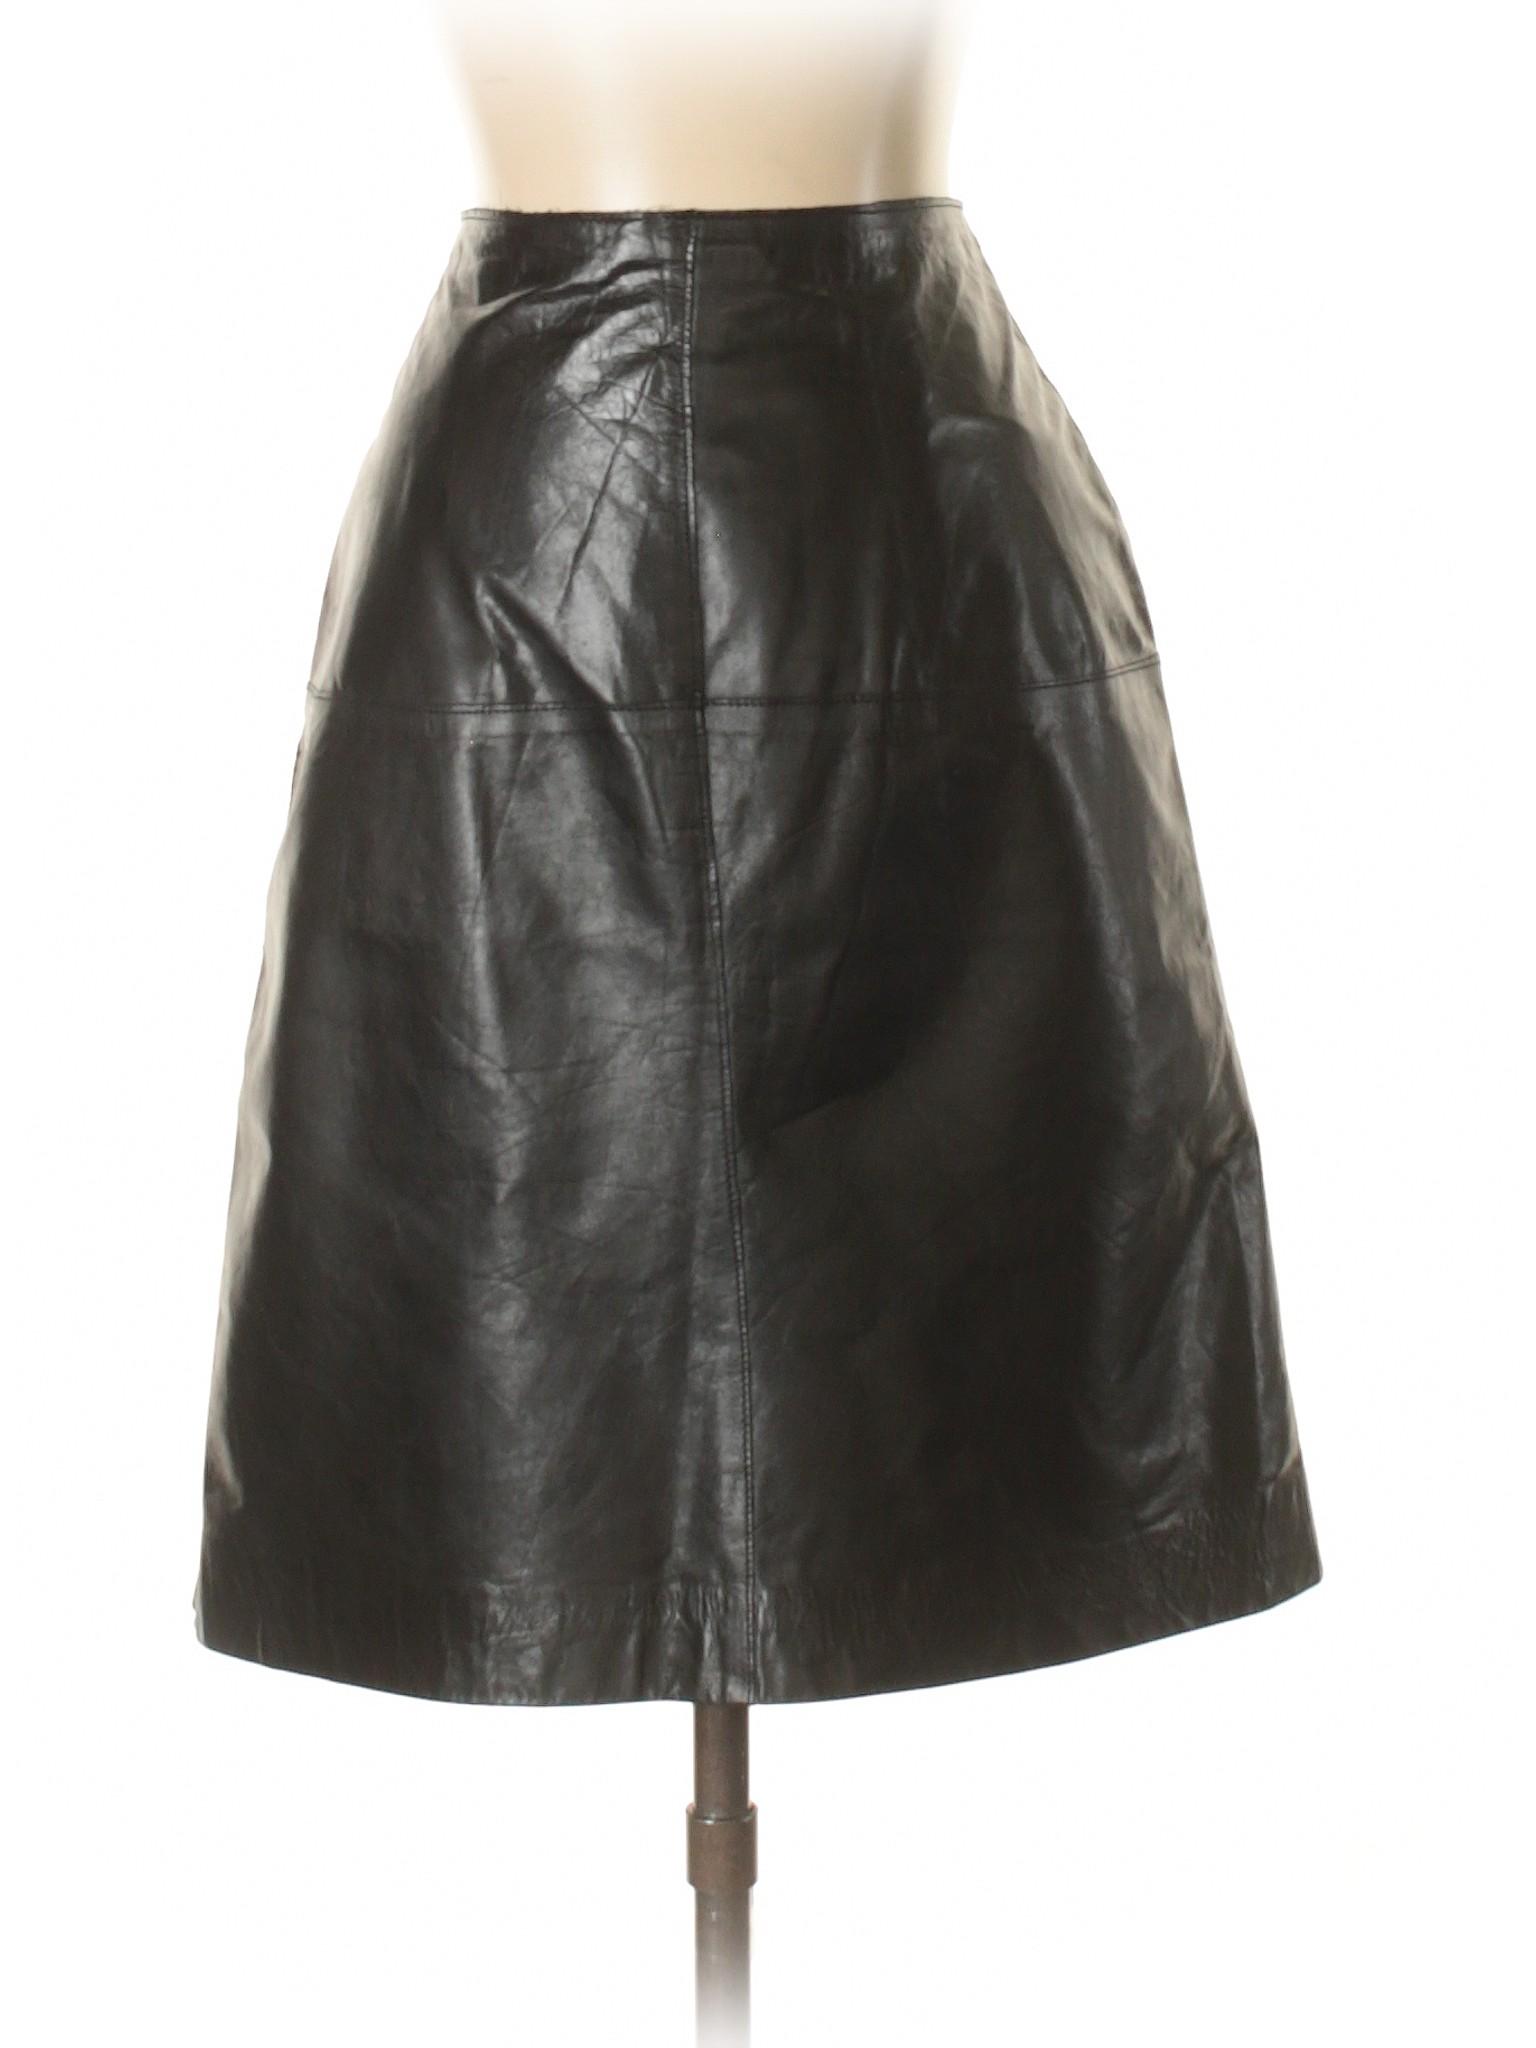 Leather Boutique Boutique Boutique Skirt Skirt Leather 6xFUH5wH